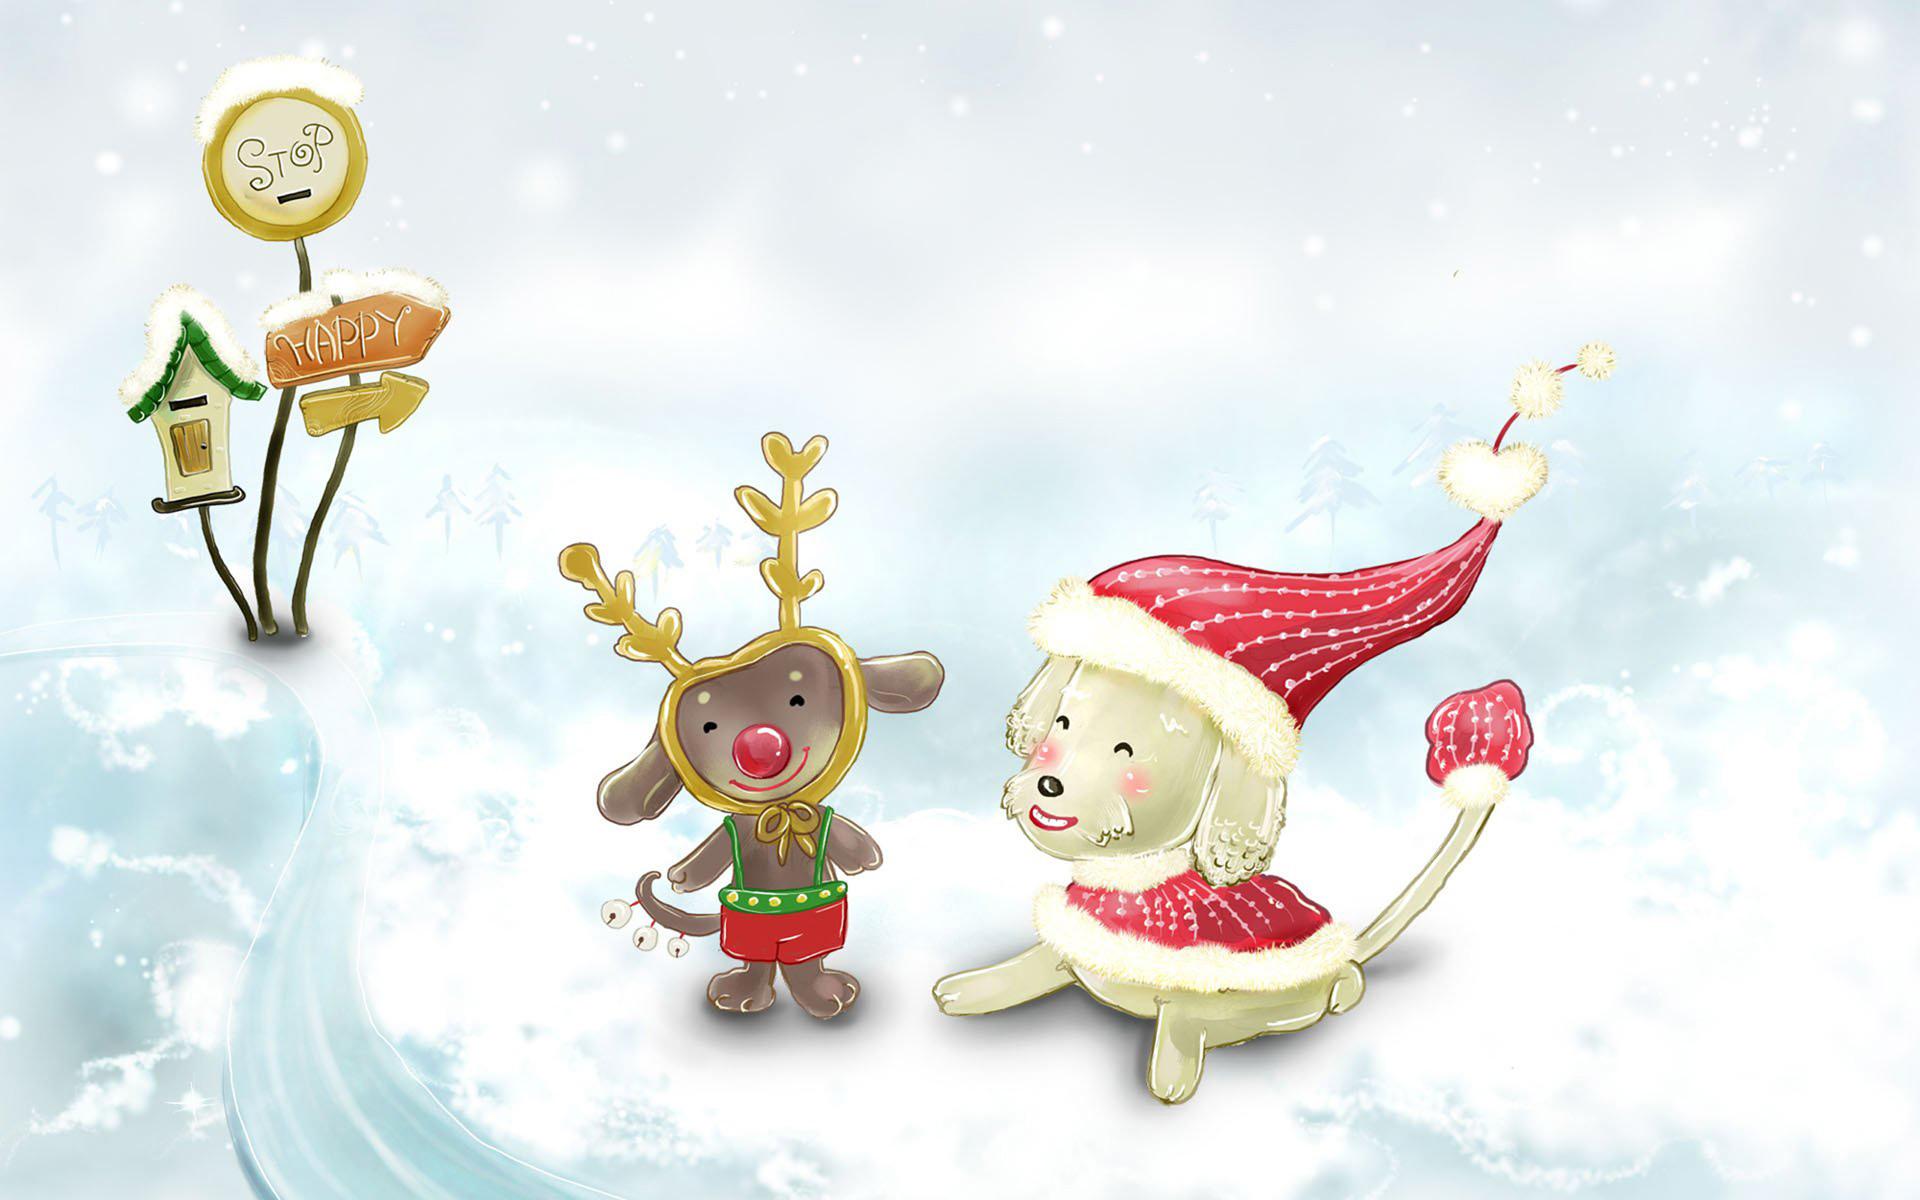 40+] Christmas Animal Wallpaper for Desktop on WallpaperSafari